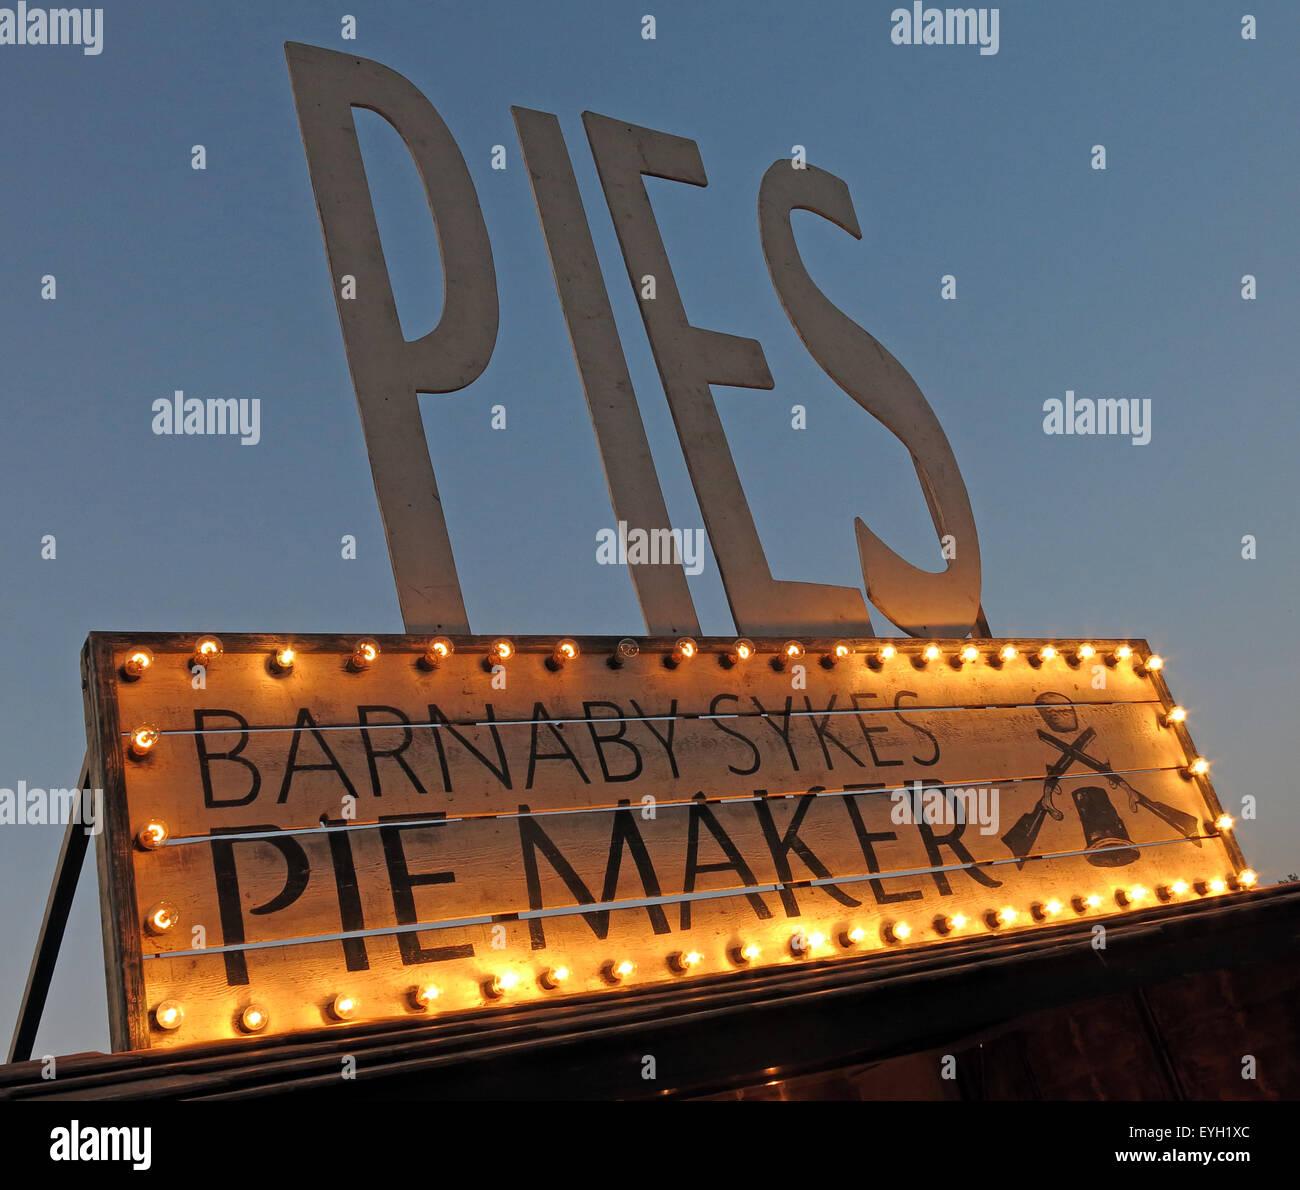 United Kingdom,GB,British,Great,Britain,Pie,England,English,Buy,on,sale,large,pastry,bake,off,BakeOff,dusk,night,evening,blue,orange,illuminated,Barnaby,Sikes,Sykes,crust,upper,factory,British Pie,This way,On Sale,Bake Off,Barnaby Sykes,Upper Crust,Pie factory,GoTonySmith,amusements,food,fast,fastfood,mash,blue,sky,Buy Pictures of,Buy Images Of,Fast Food,Pie and mash,blue sky